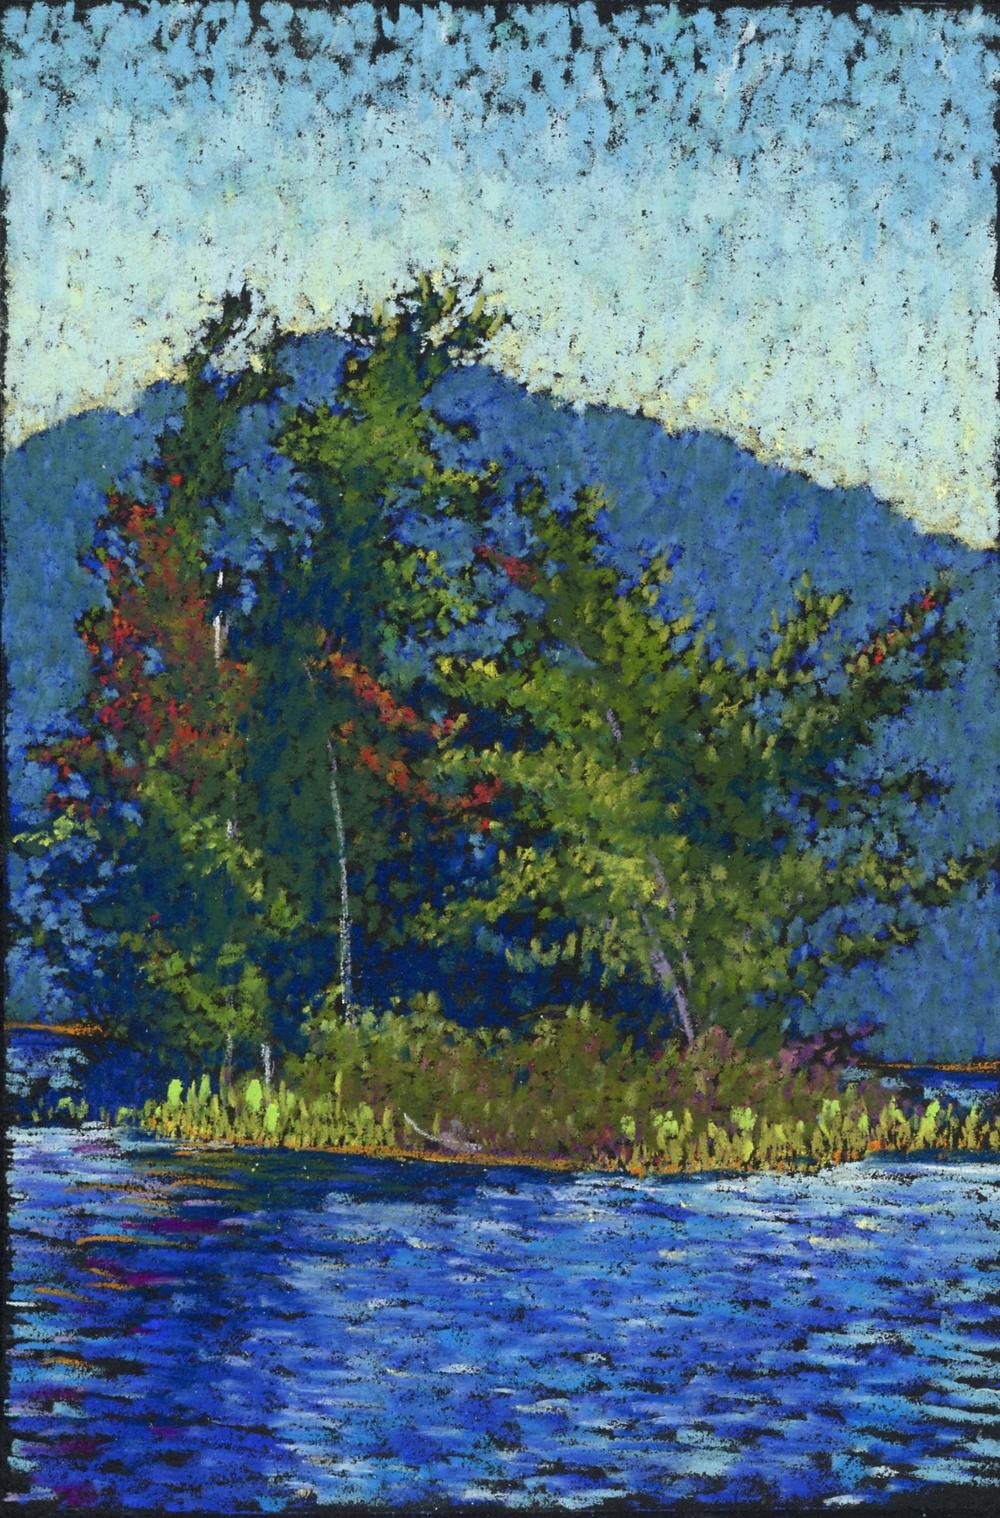 """Snake Island"", 2007, pastel on paper, 7"" x 5"""